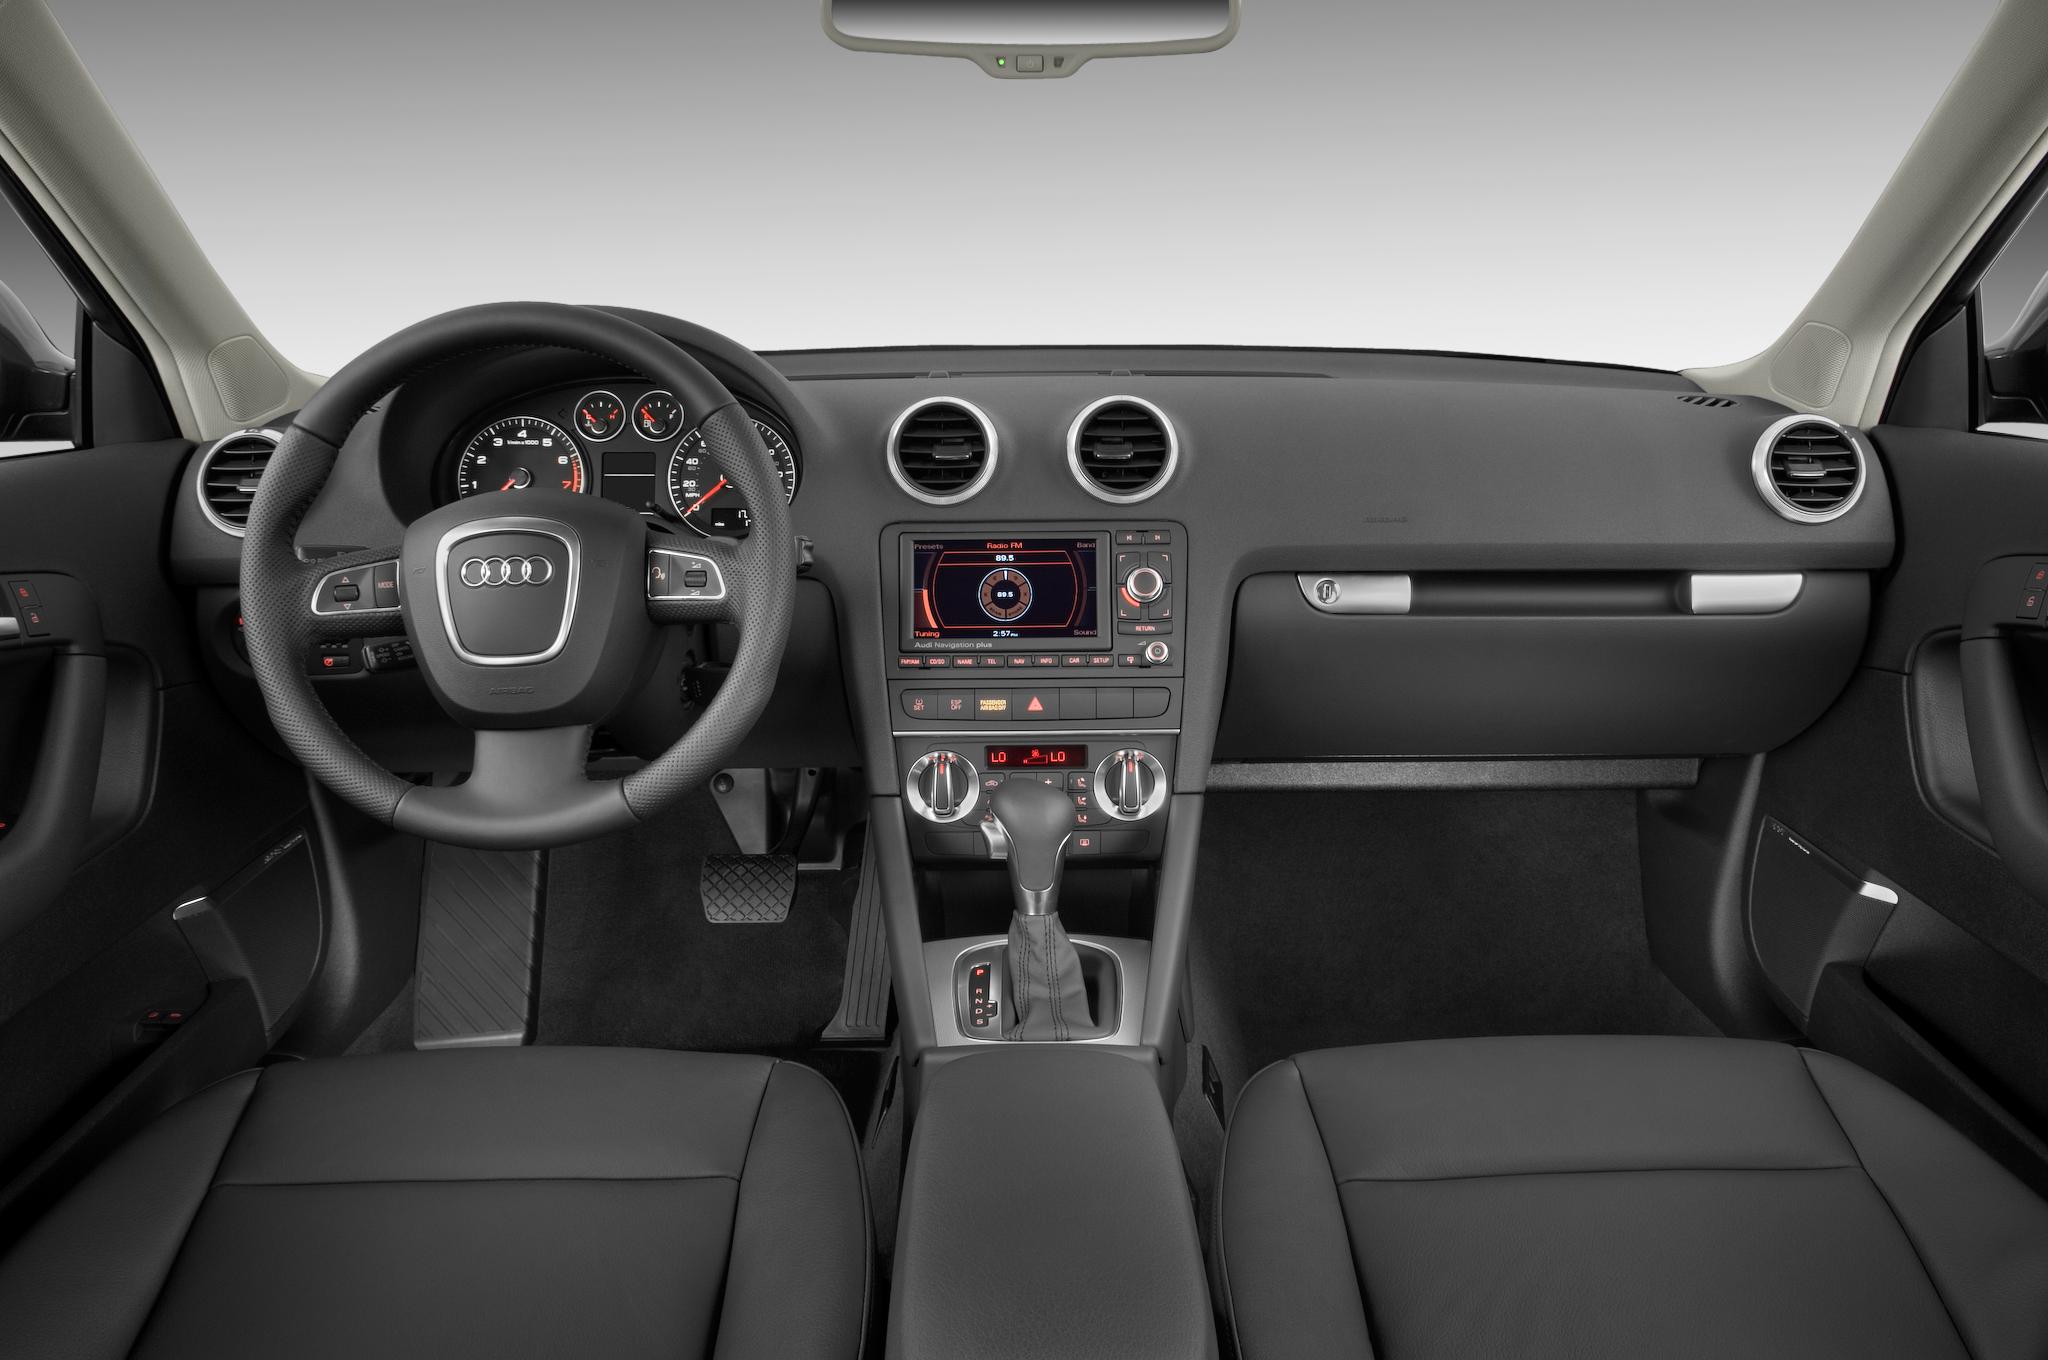 2010 Audi A3 Tdi Fuel Efficient News Hybrid Cars And